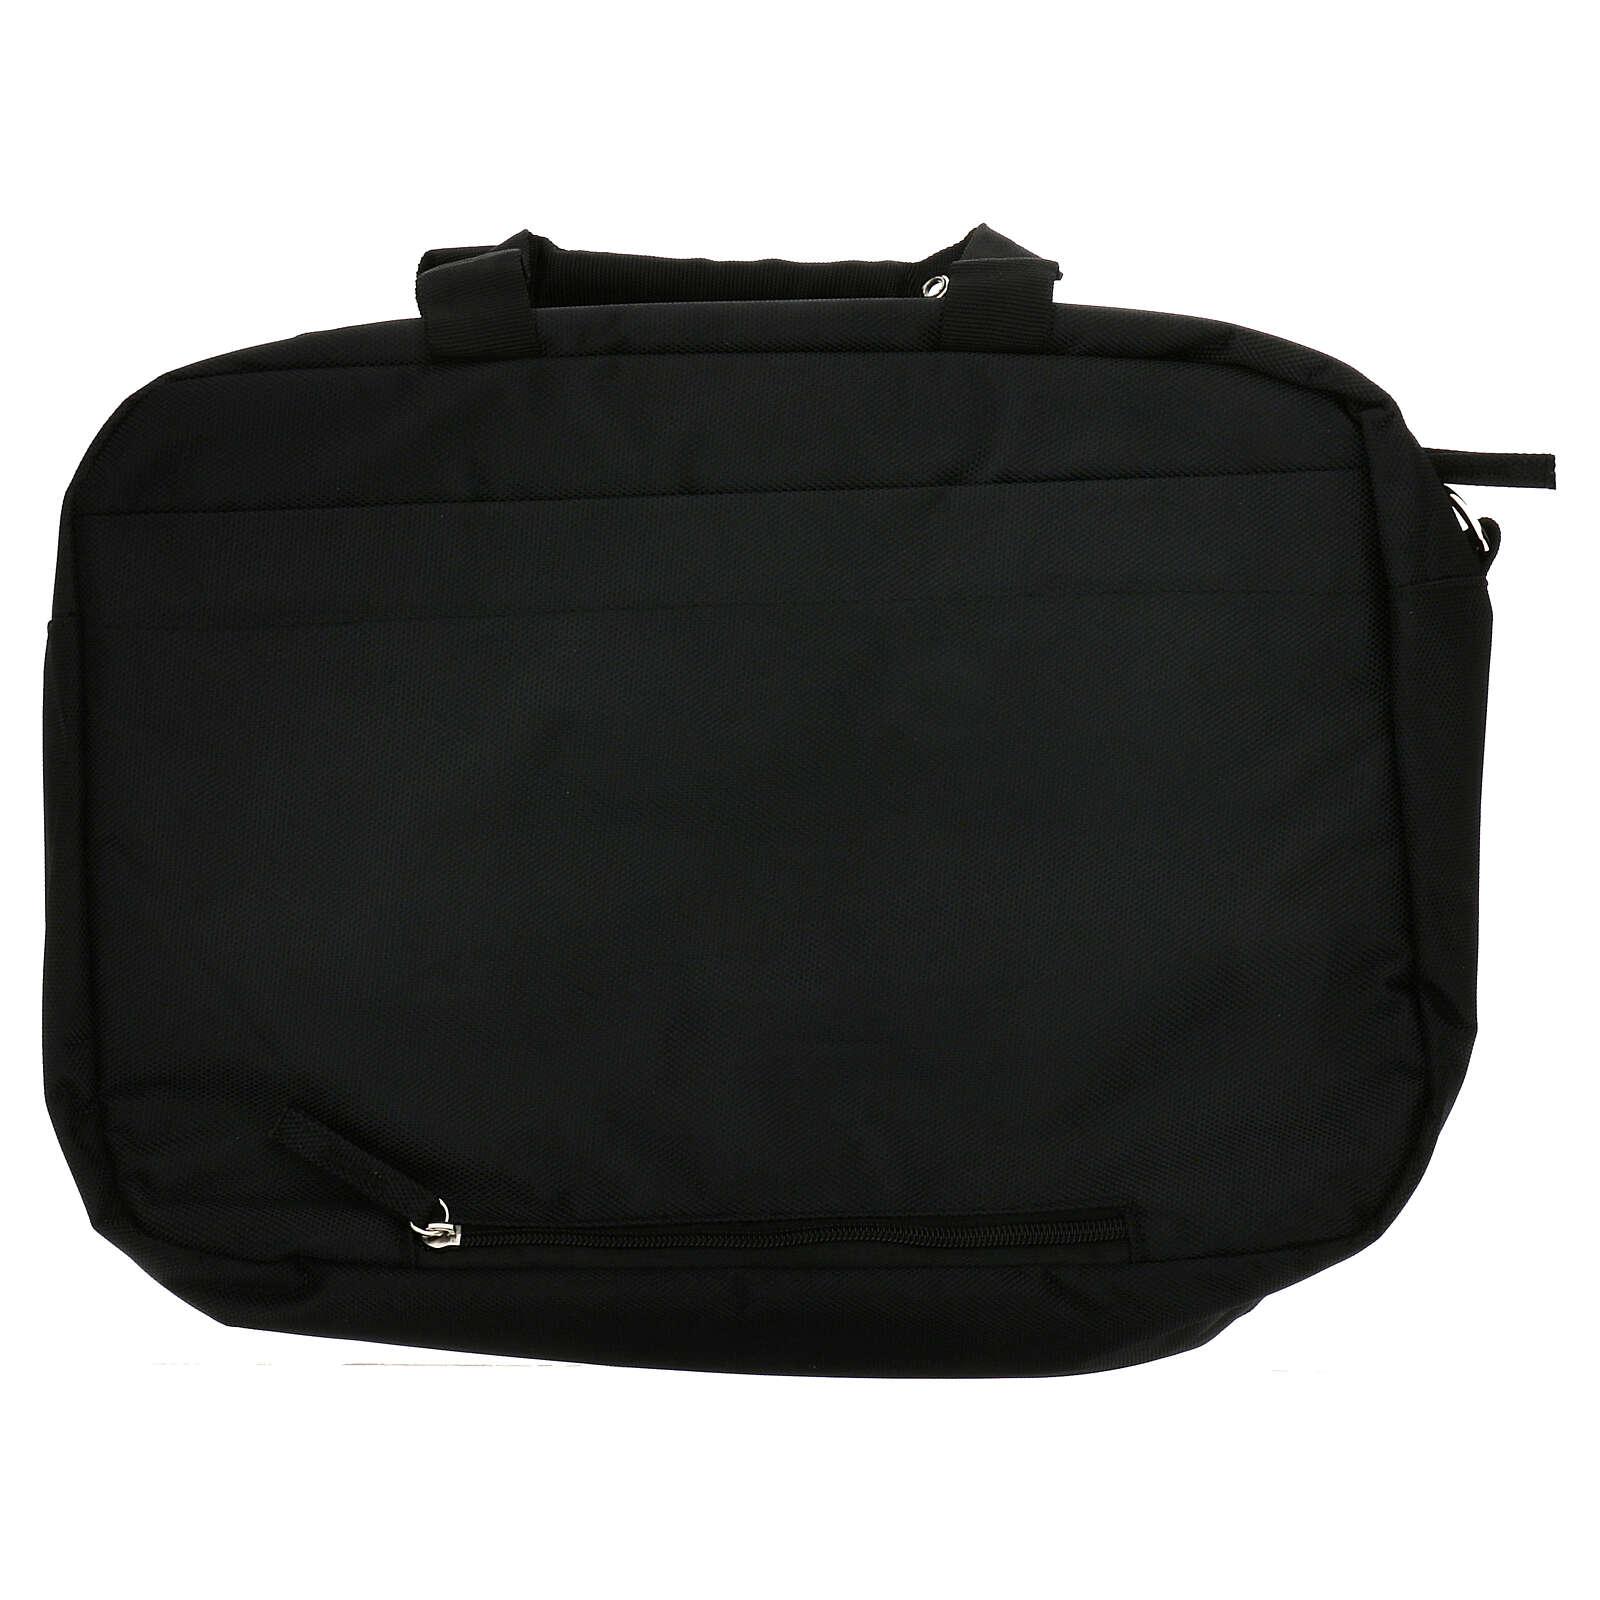 Computer bag with travel mass kit 3